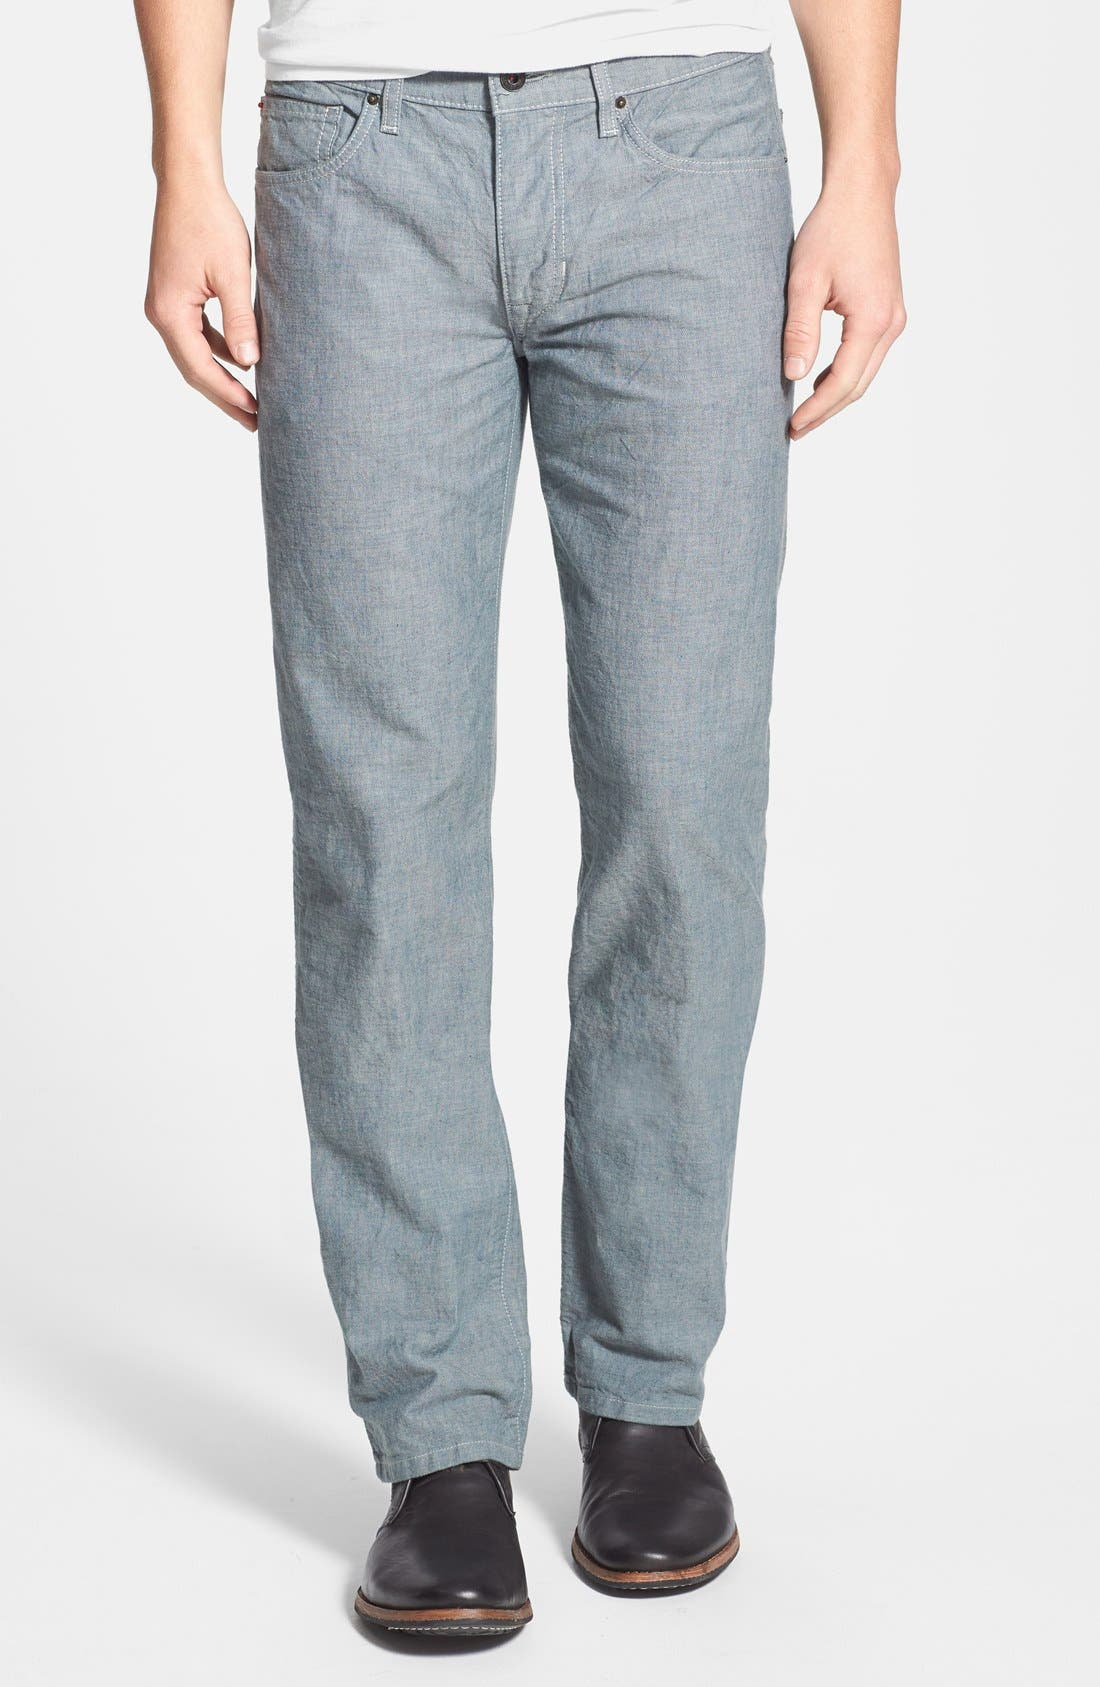 Main Image - Joe's 'Brixton' Slim Fit Canvas Denim Jeans (Sidewalk)